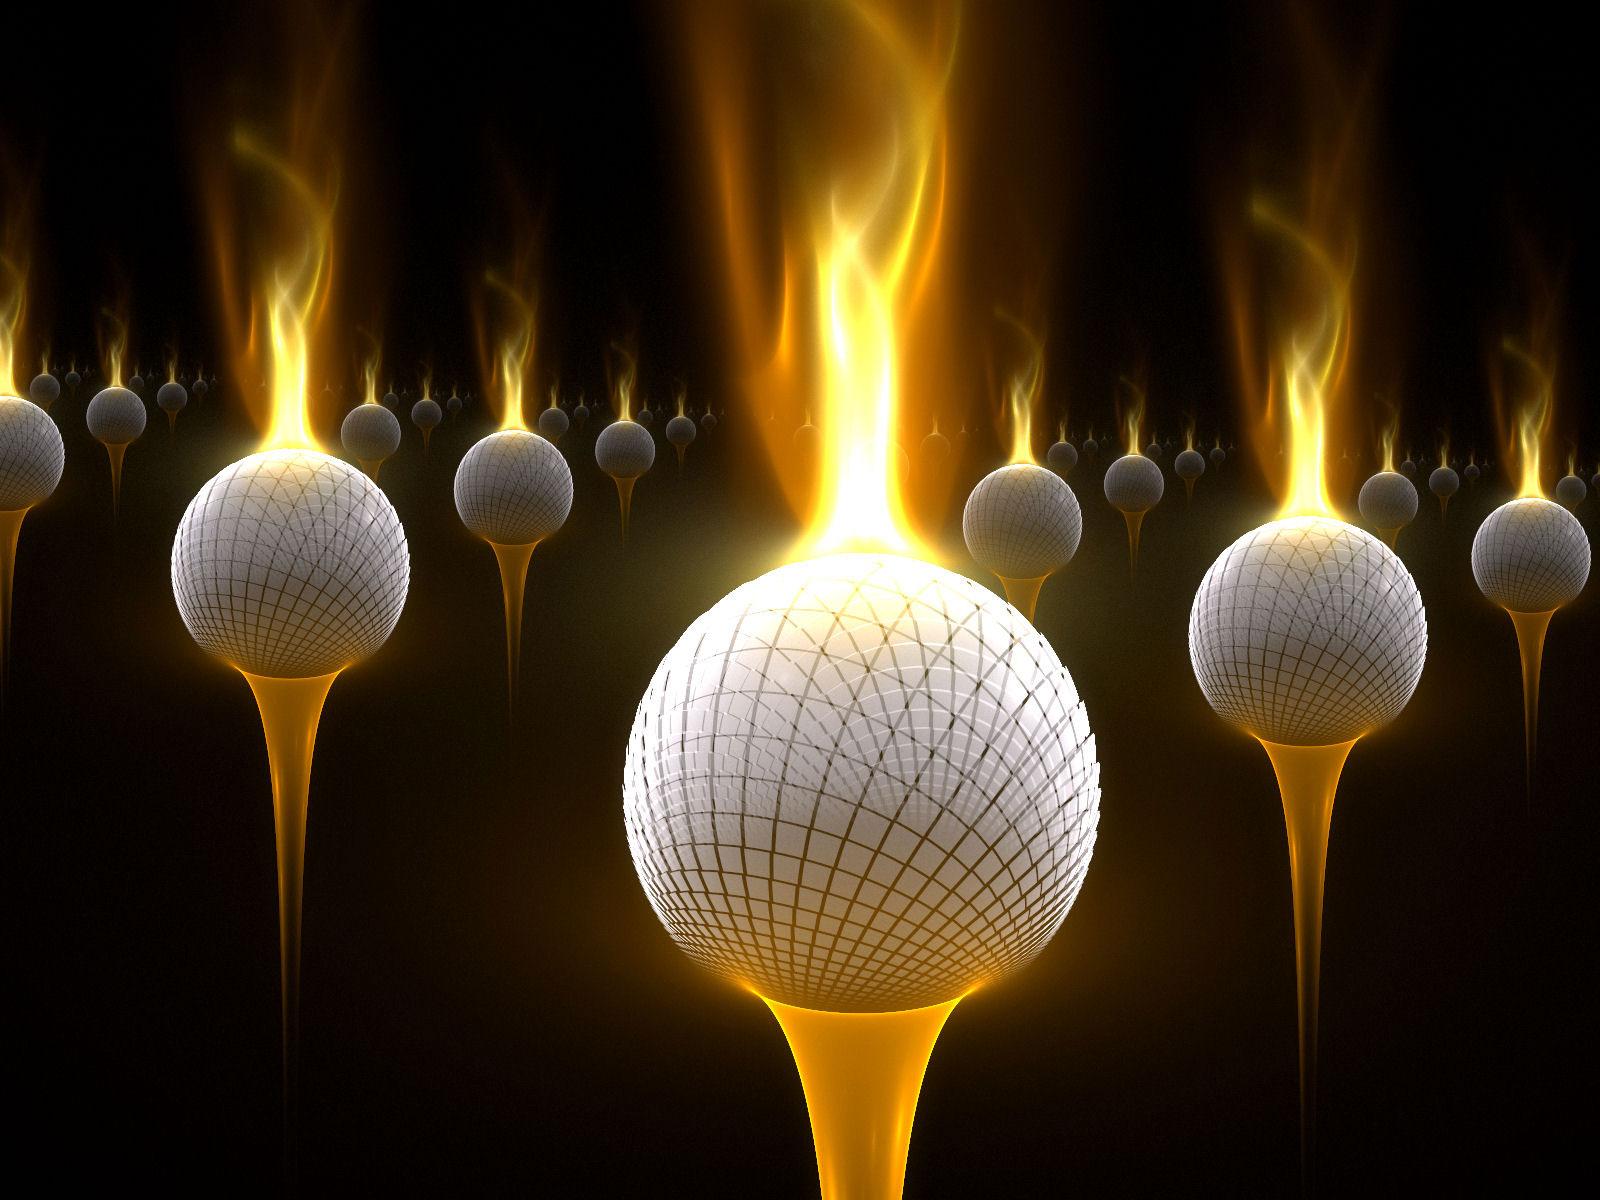 http://4.bp.blogspot.com/-N_L5jMwDxvM/TZb78T_7LfI/AAAAAAAABAM/dDyodfI_nPw/s1600/golf+burning-golf-balls-wallpaper.jpg